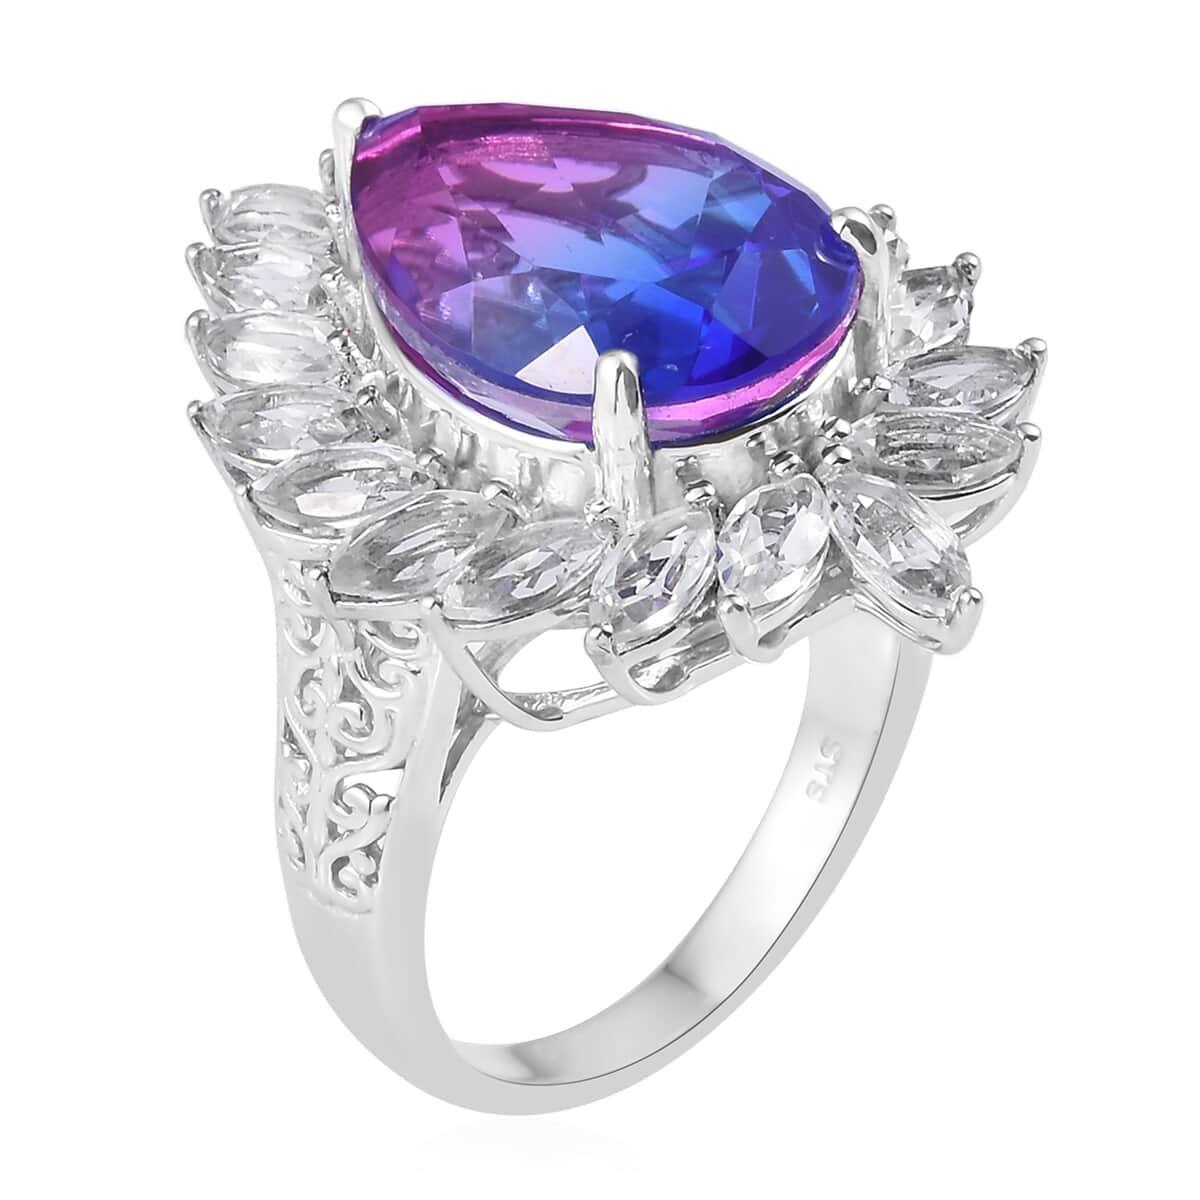 Midnight Fuchsia Quartz, White Topaz Ring in Platinum Over Sterling Silver (Size 7.0) 17.85 ctw